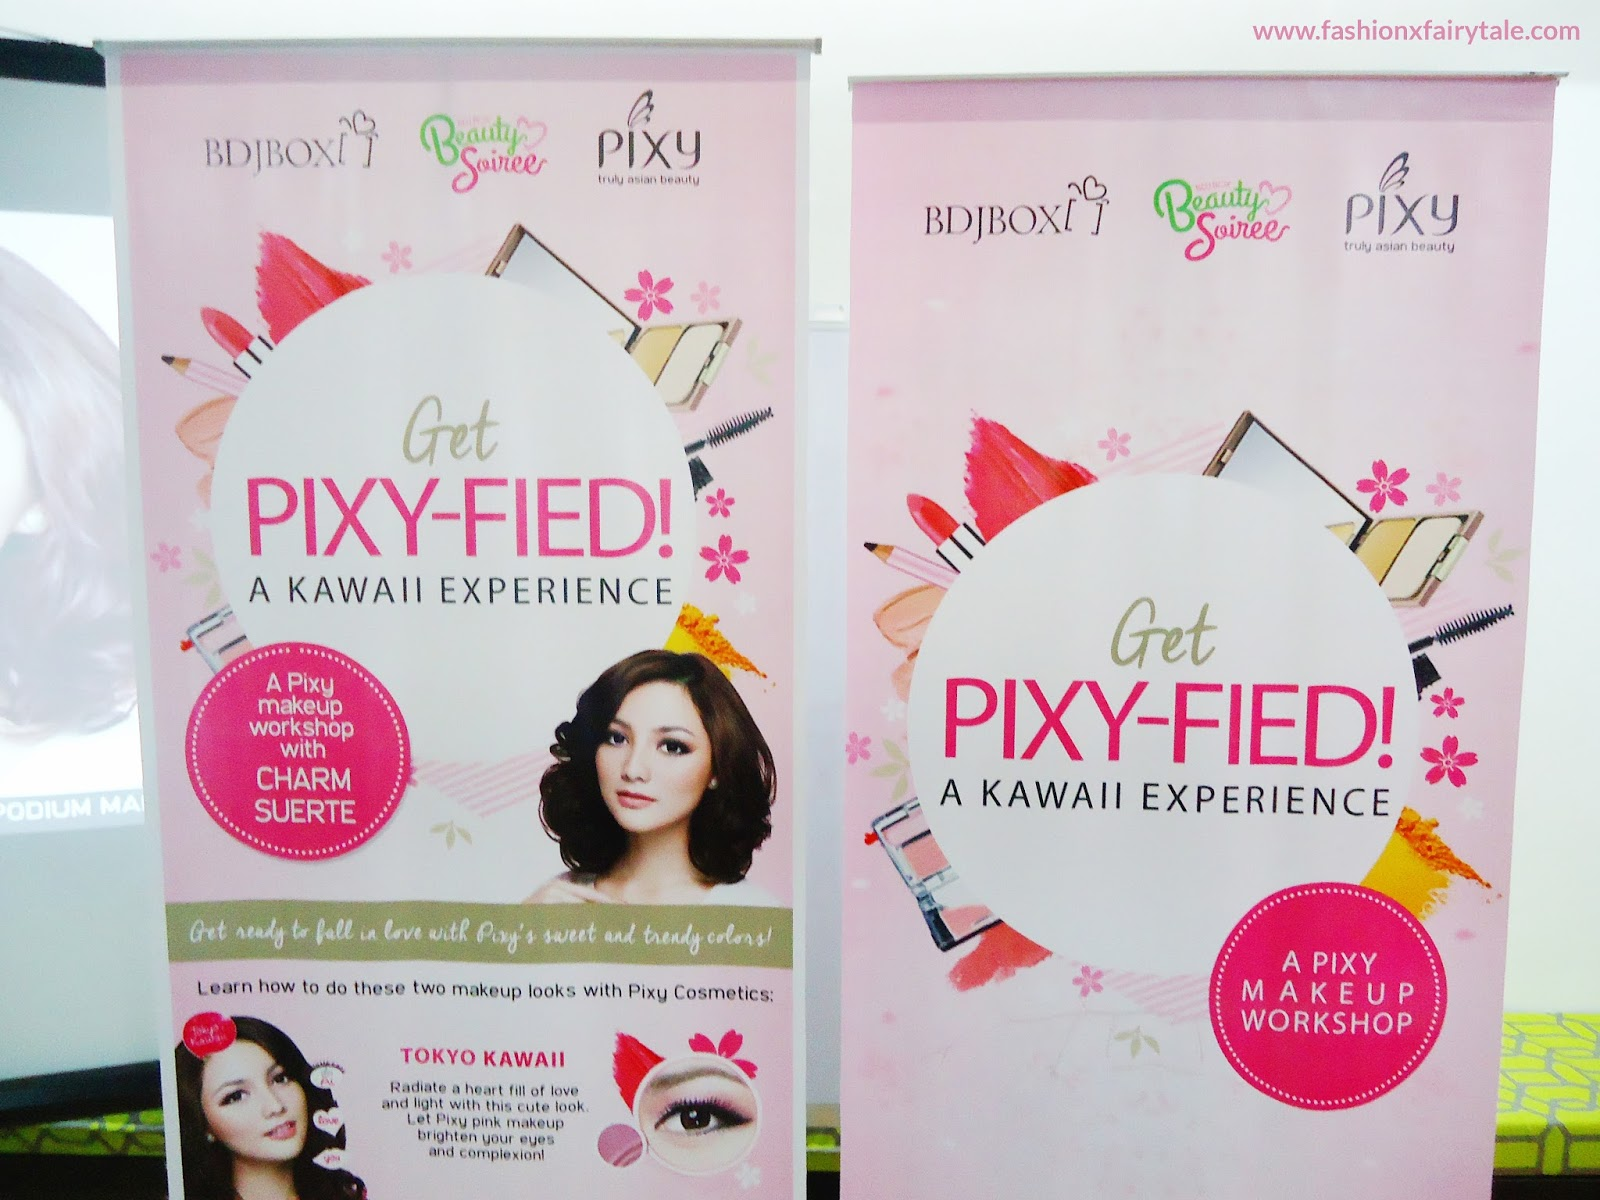 Get Pixy-fied, a Kawaii Experience   BDJ Box Beauty Soiree Event